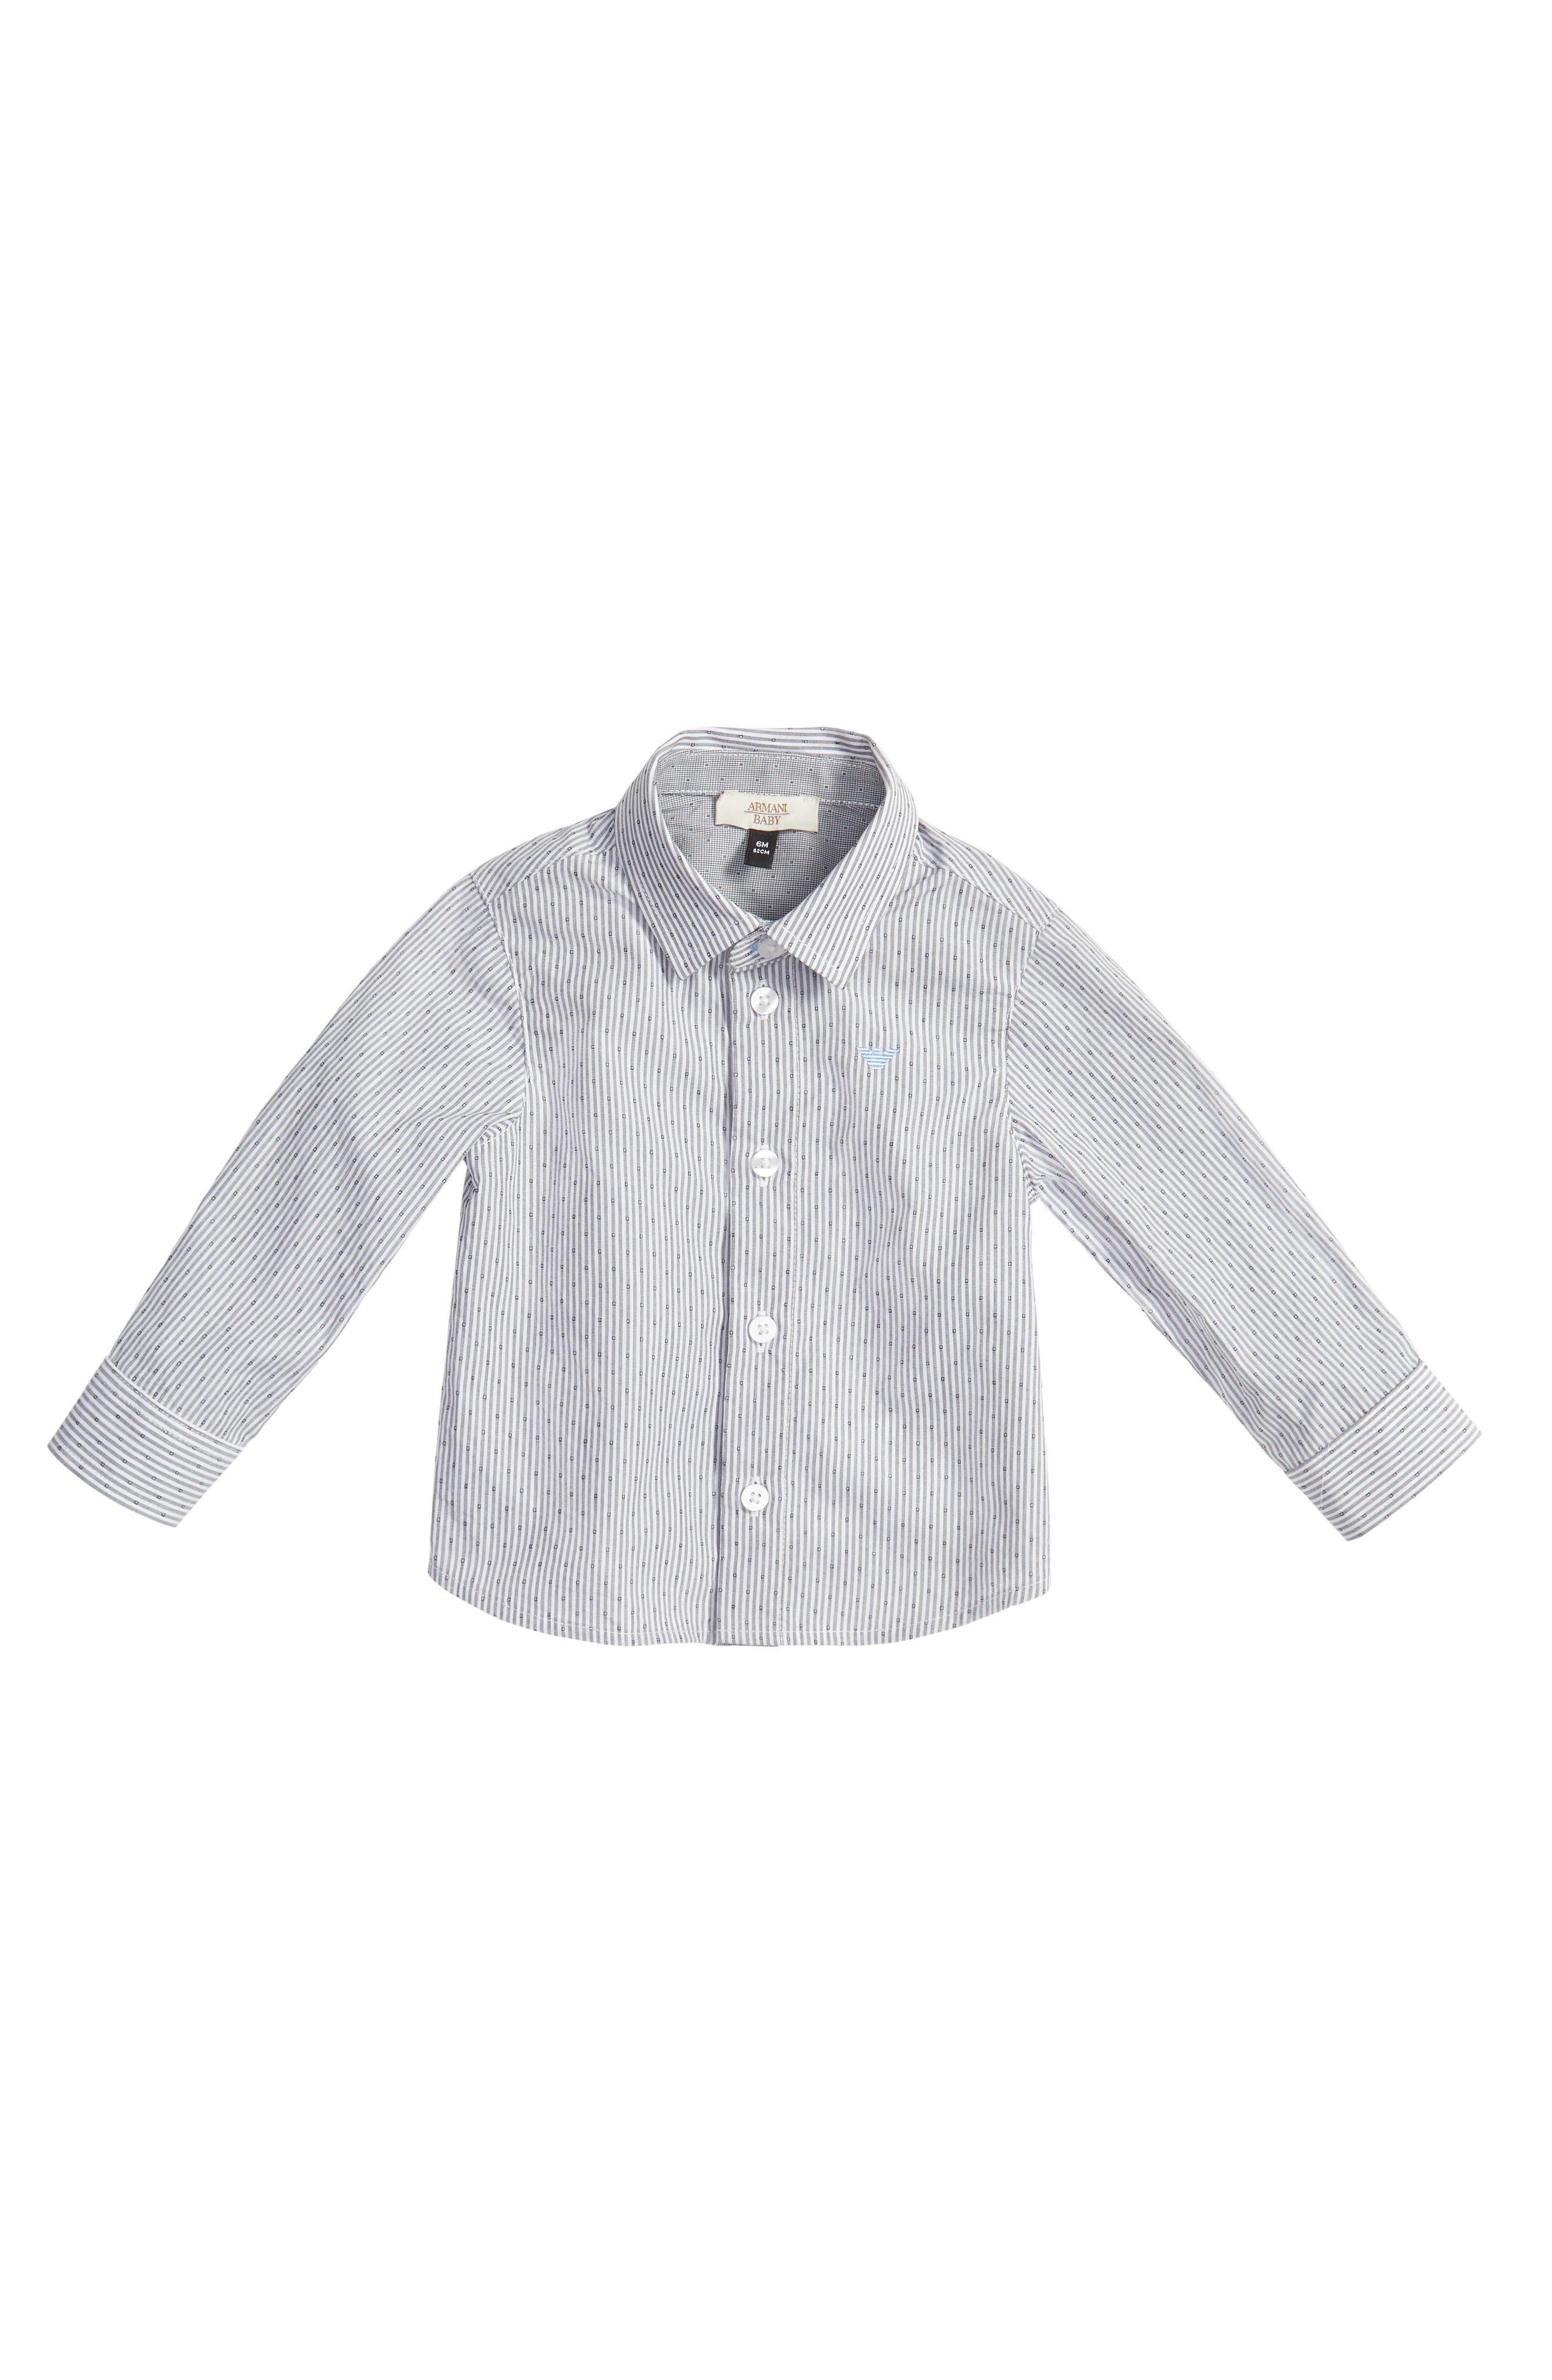 ARMANI JUNIOR Stripe Dress Shirt